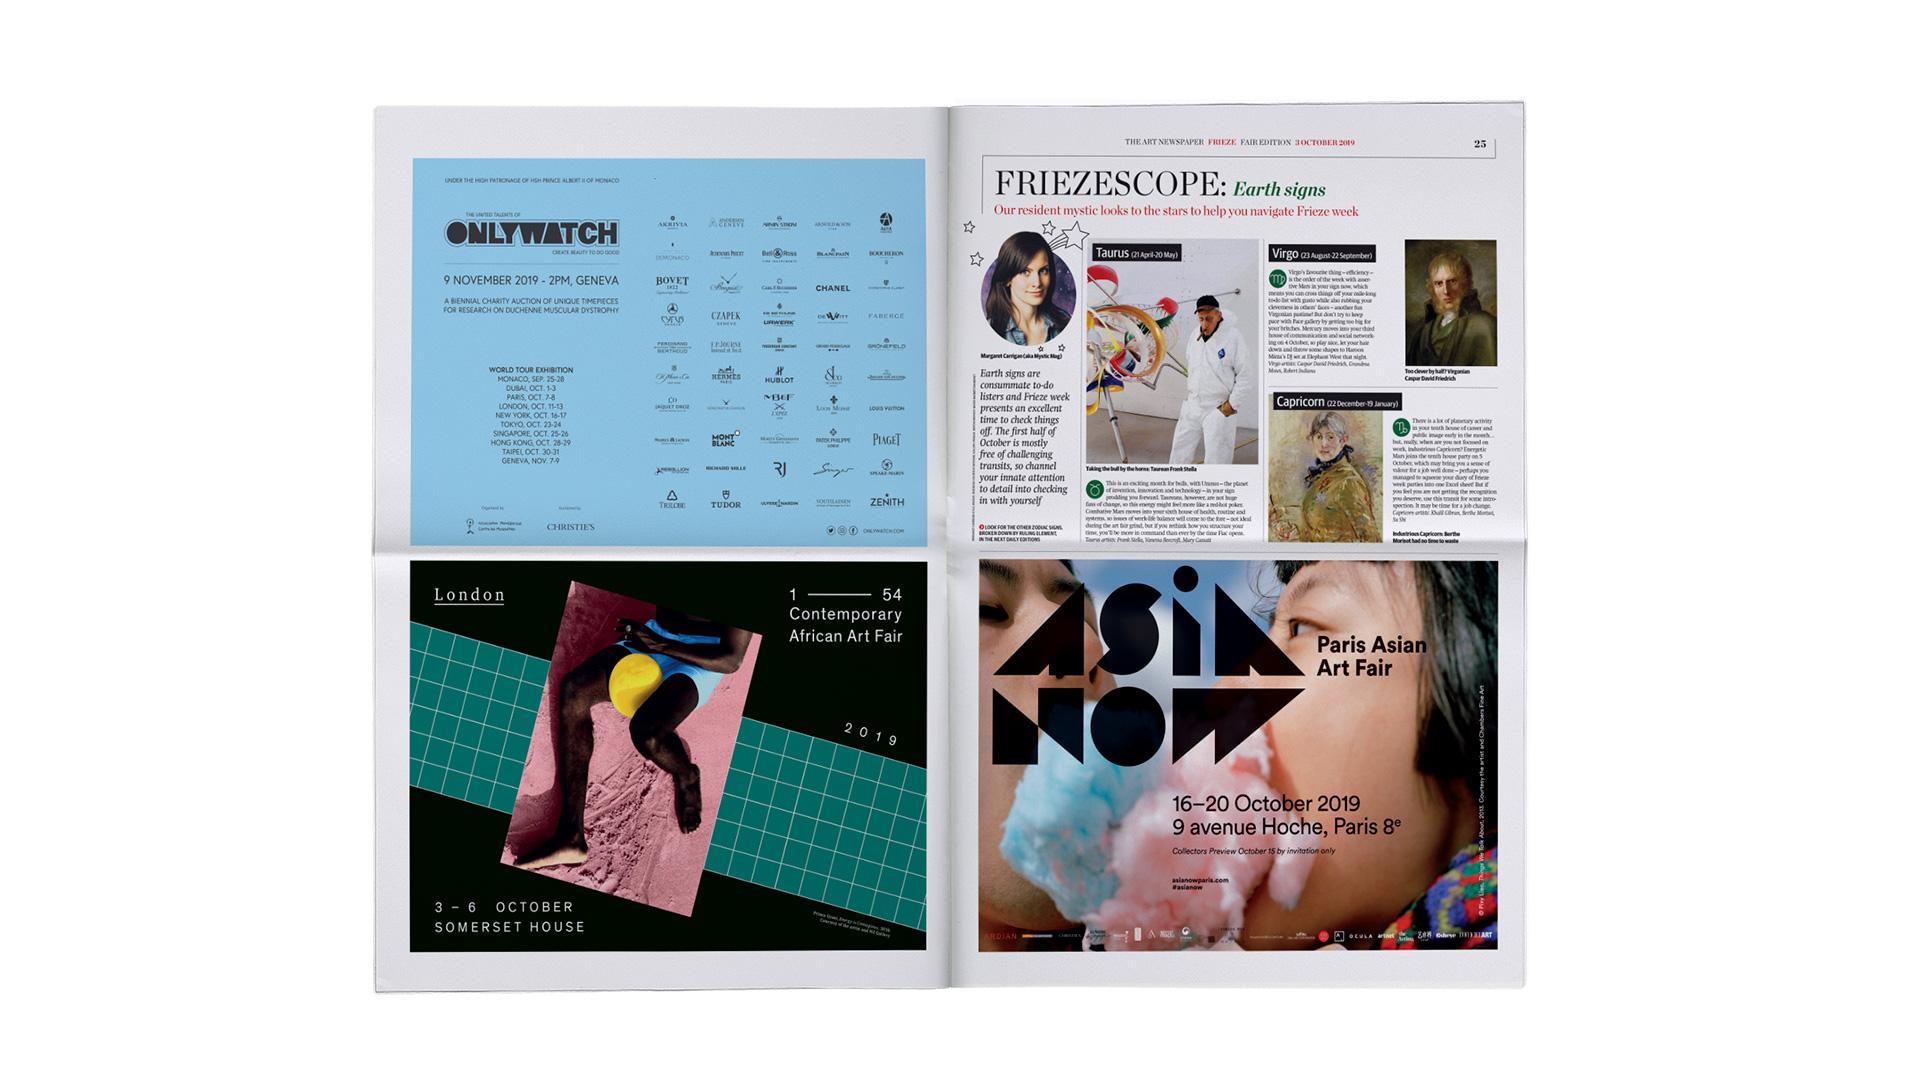 TAN-Newspaper-Frieze-LON-2019-DPS-10